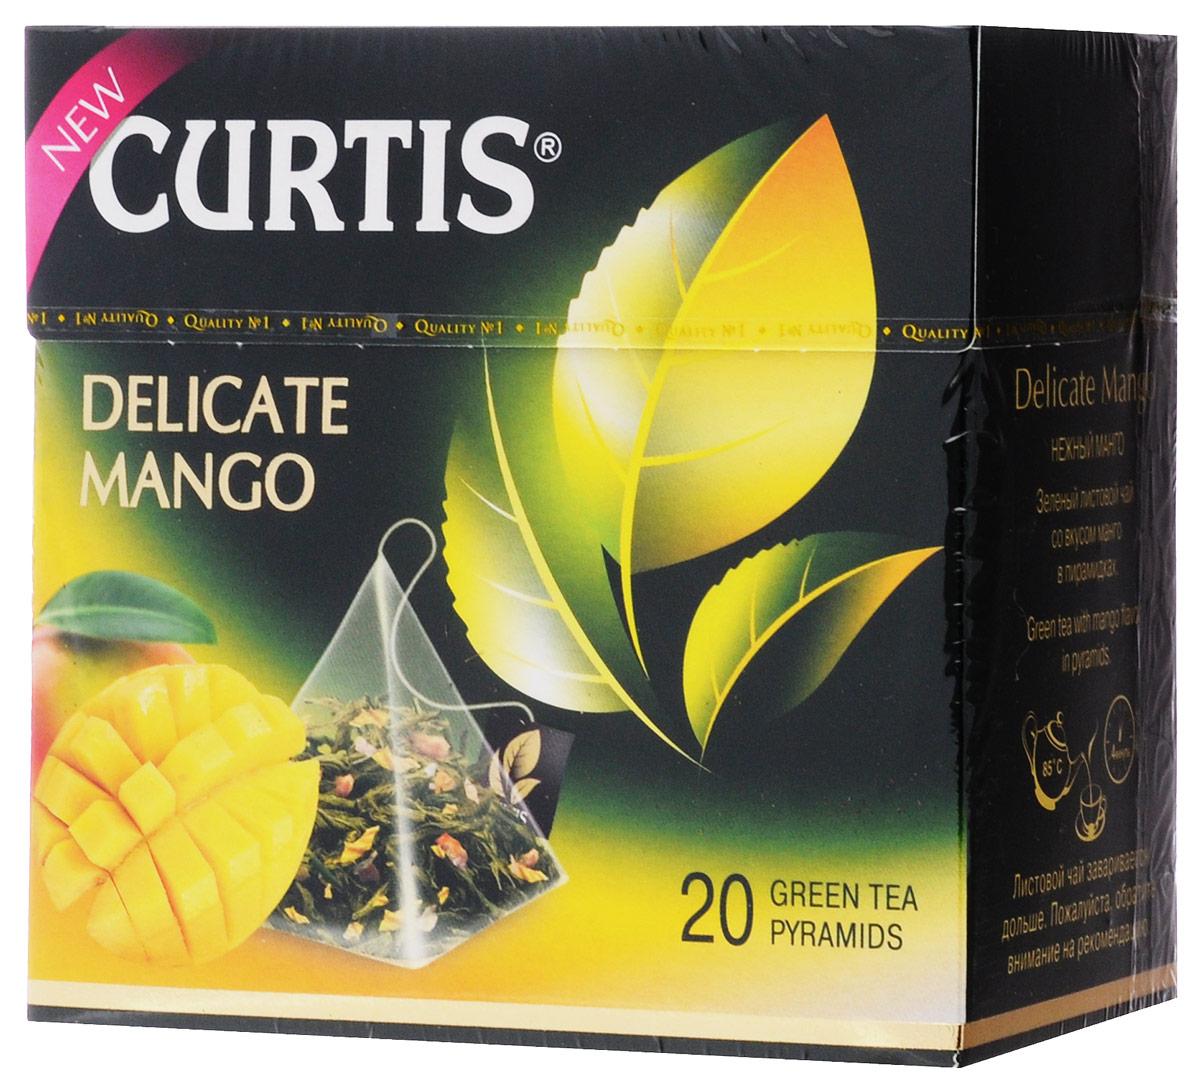 Curtis Delicate Mango зеленый чай в пирамидках, 20 шт delicate love de019ewpcm83 delicate love